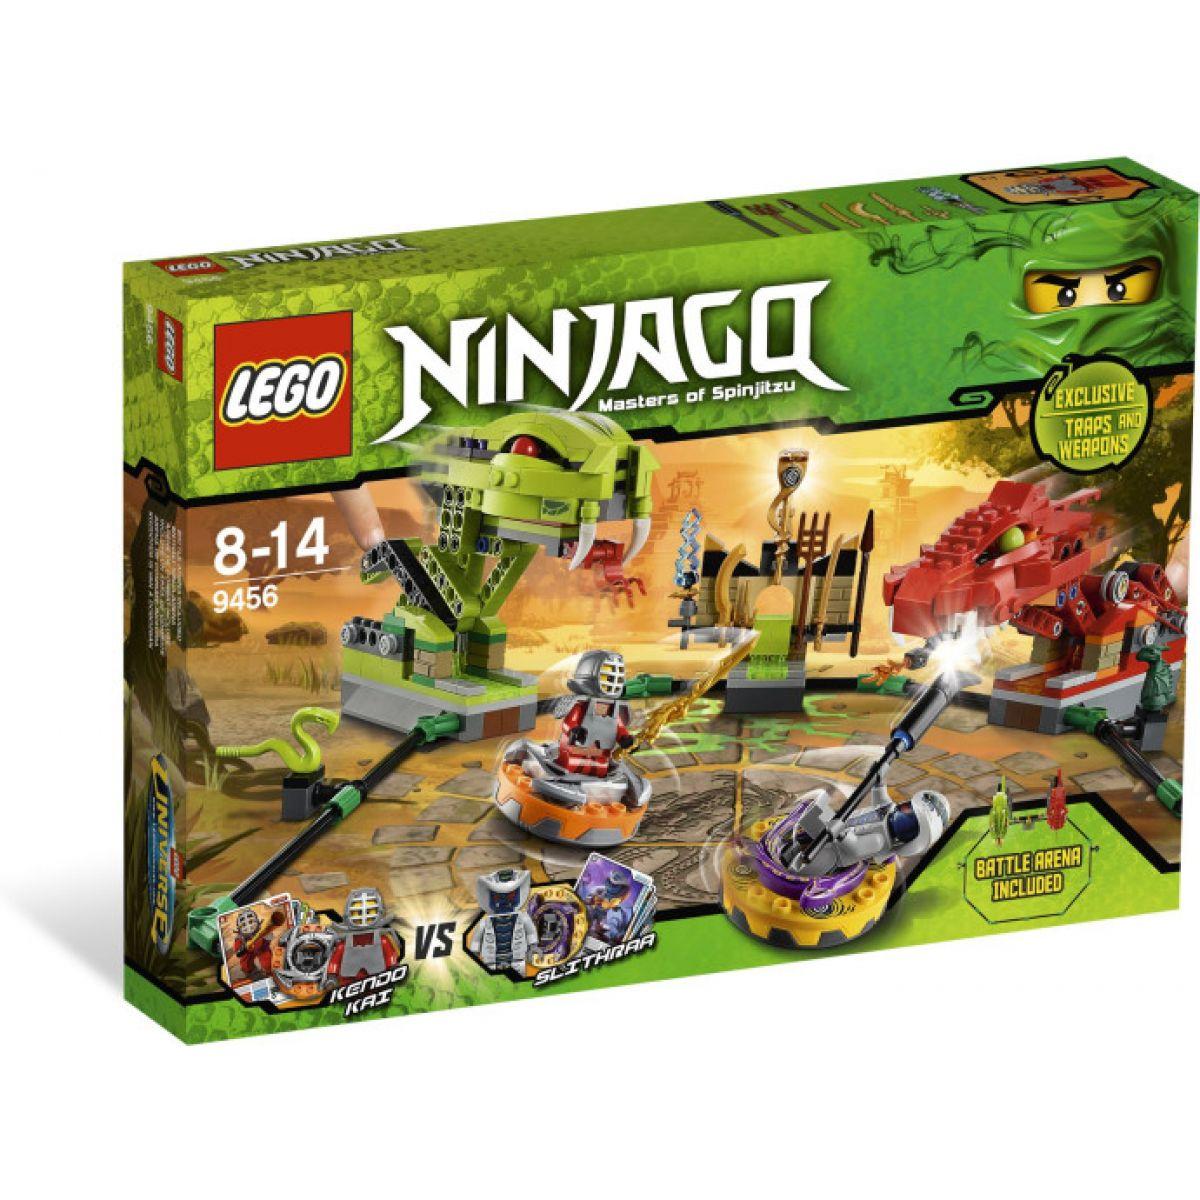 LEGO Ninjago 9456 Spinner Battle